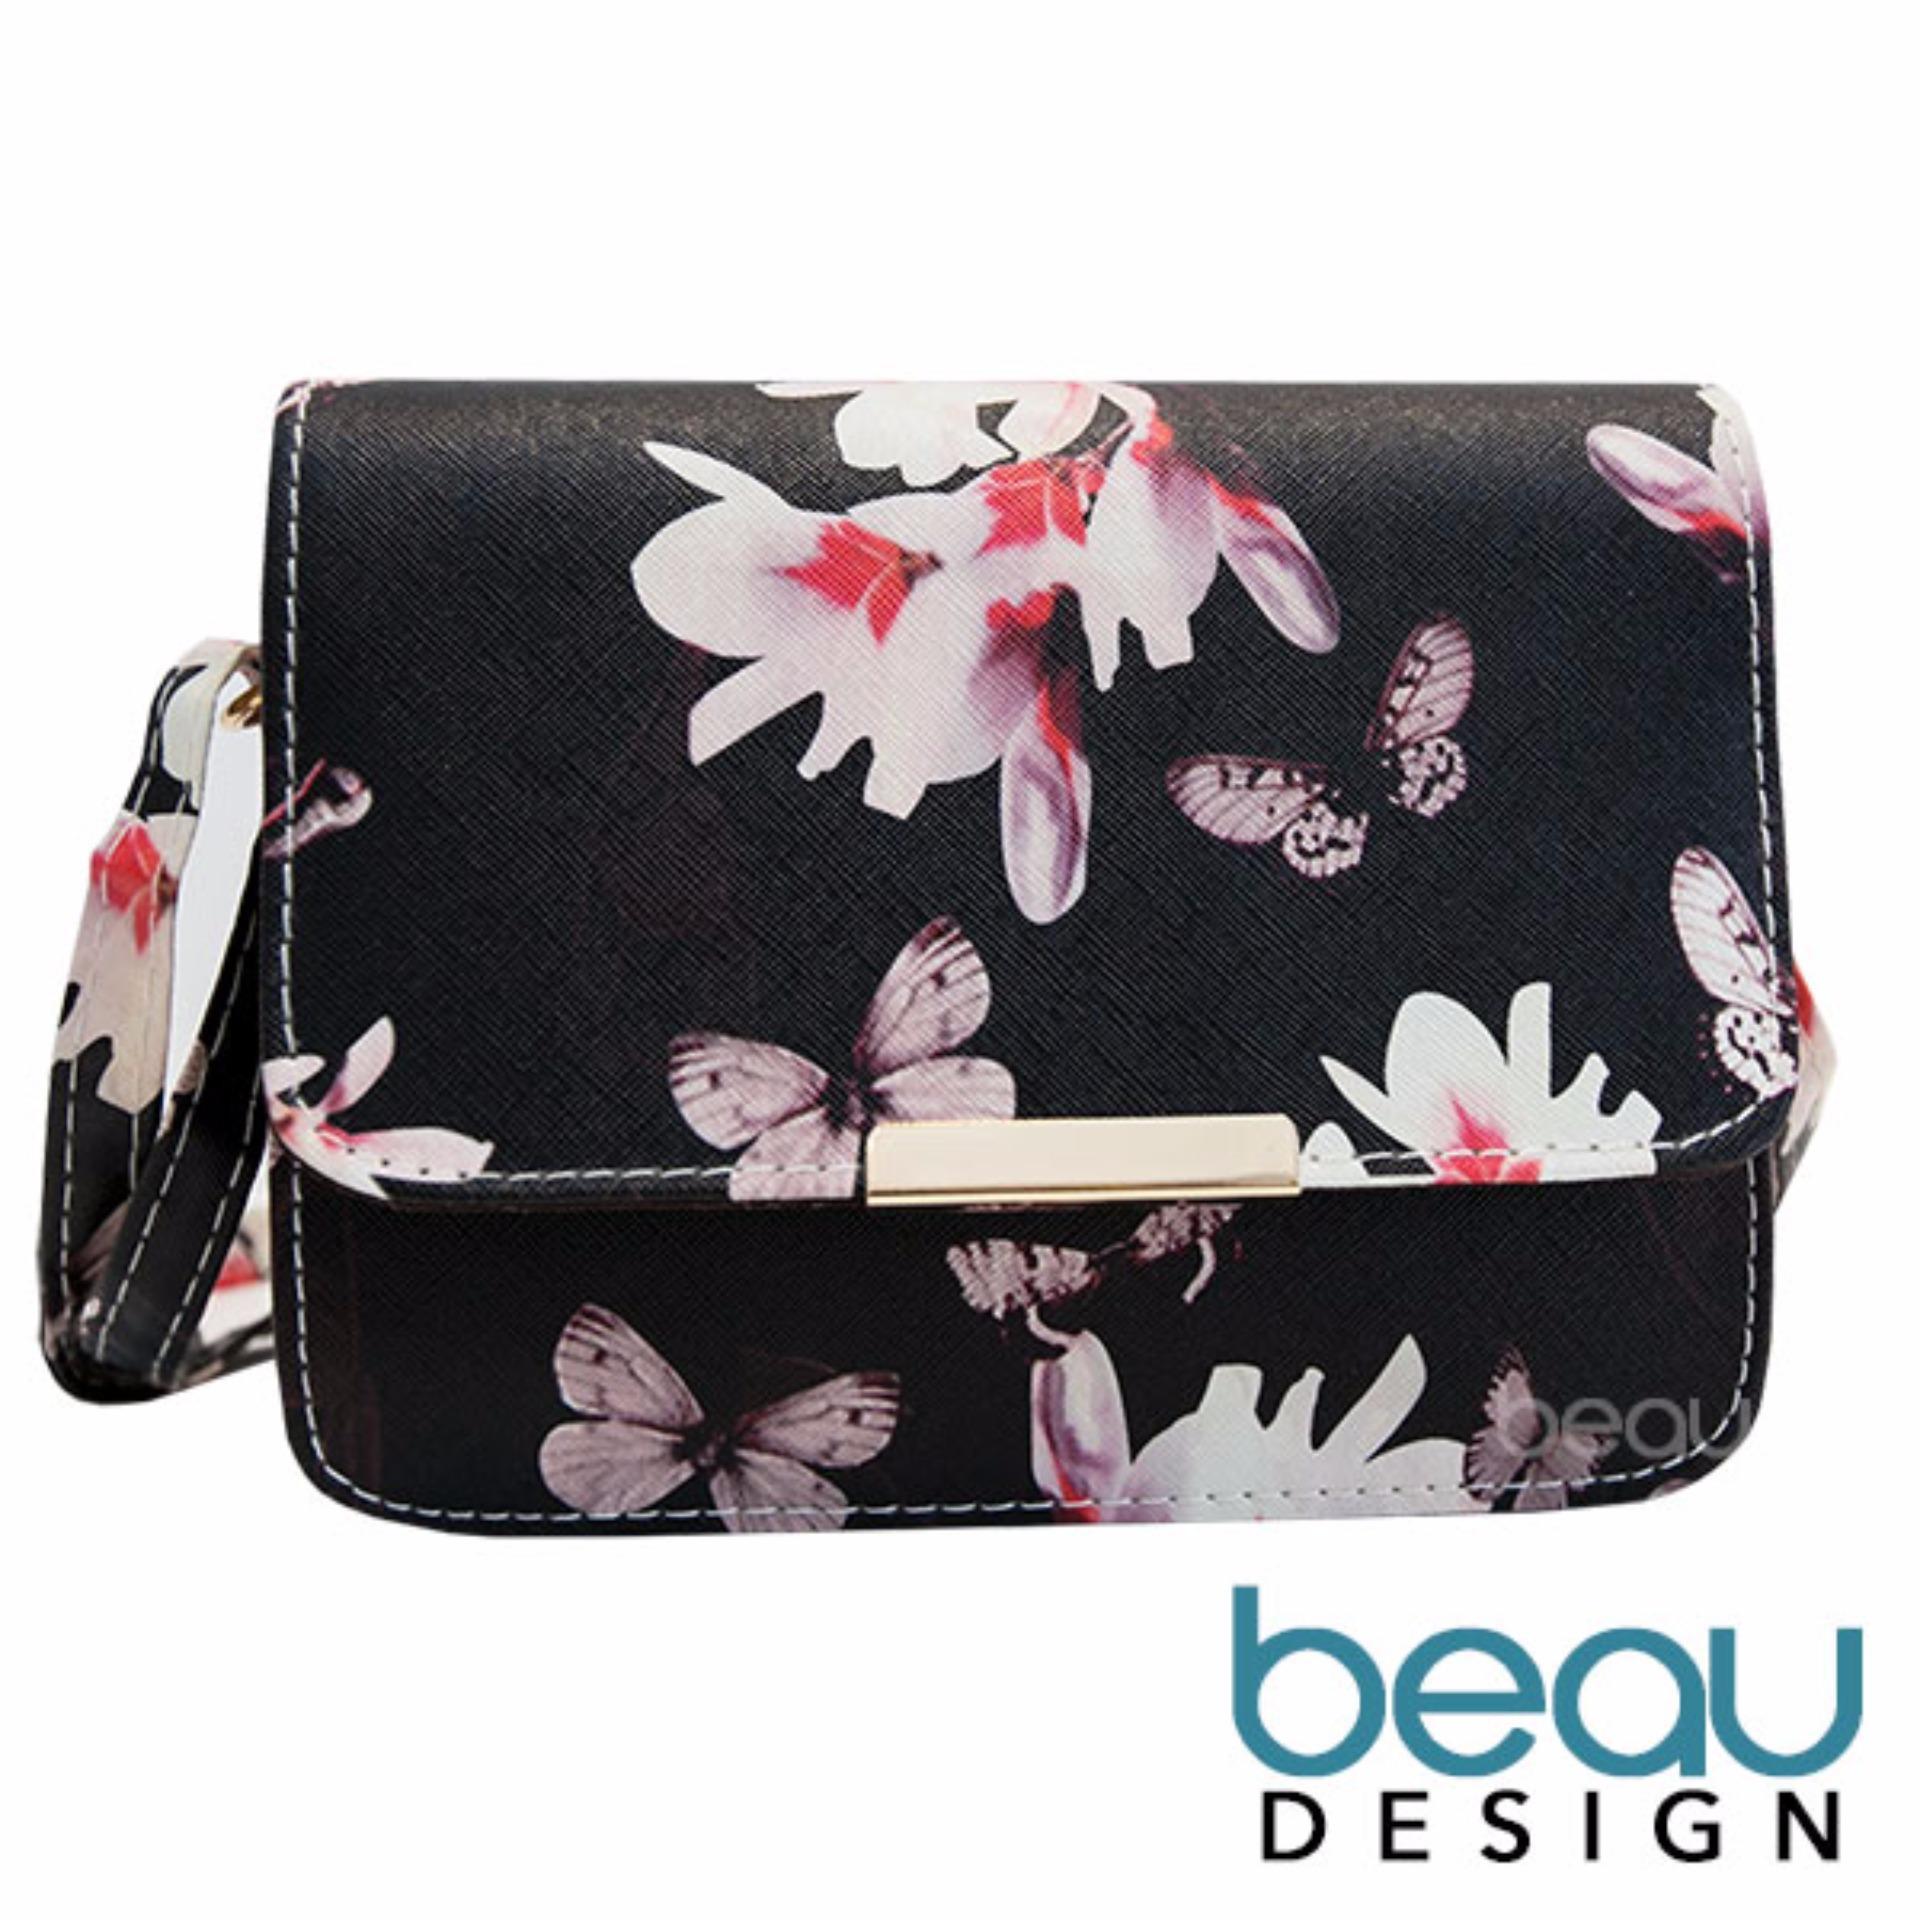 Suitable for casual outlook Beau Design Tas Wanita Bunga Kupu Kupu PU Leather Women Flower